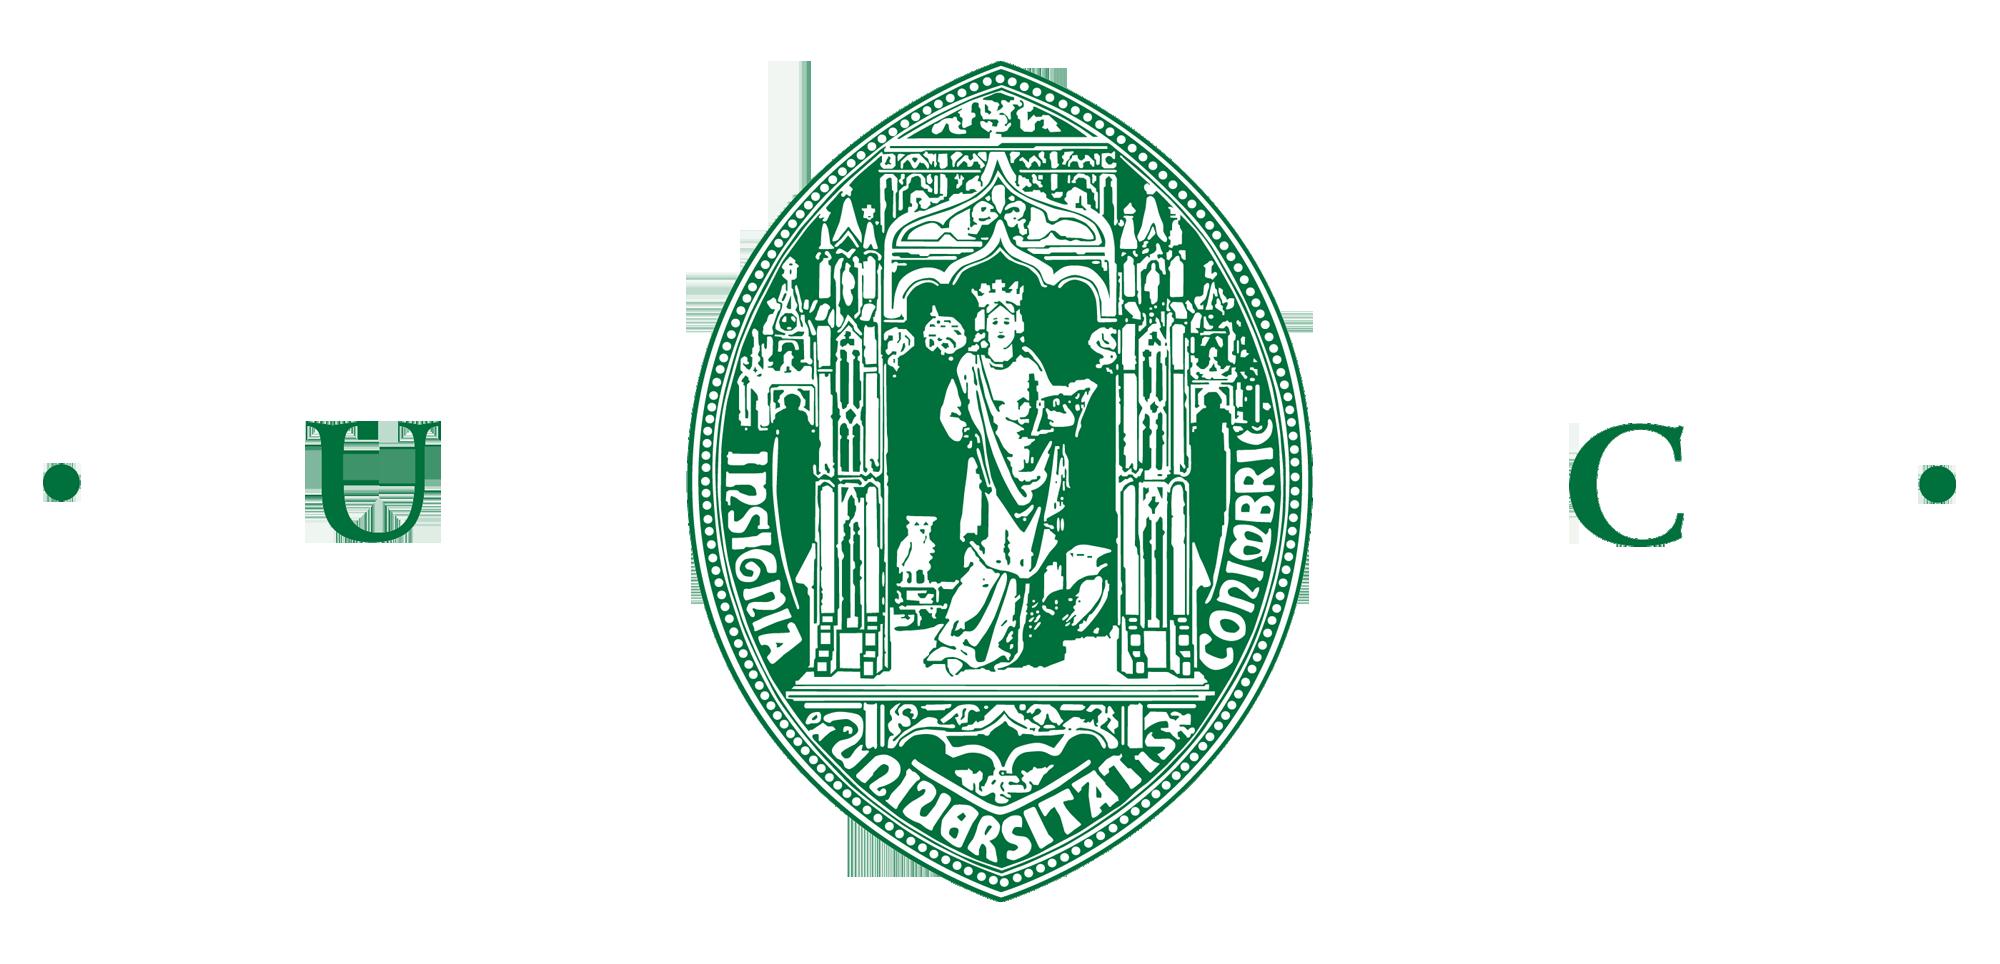 University of Coimbra [[seal (emblem)|seal]]